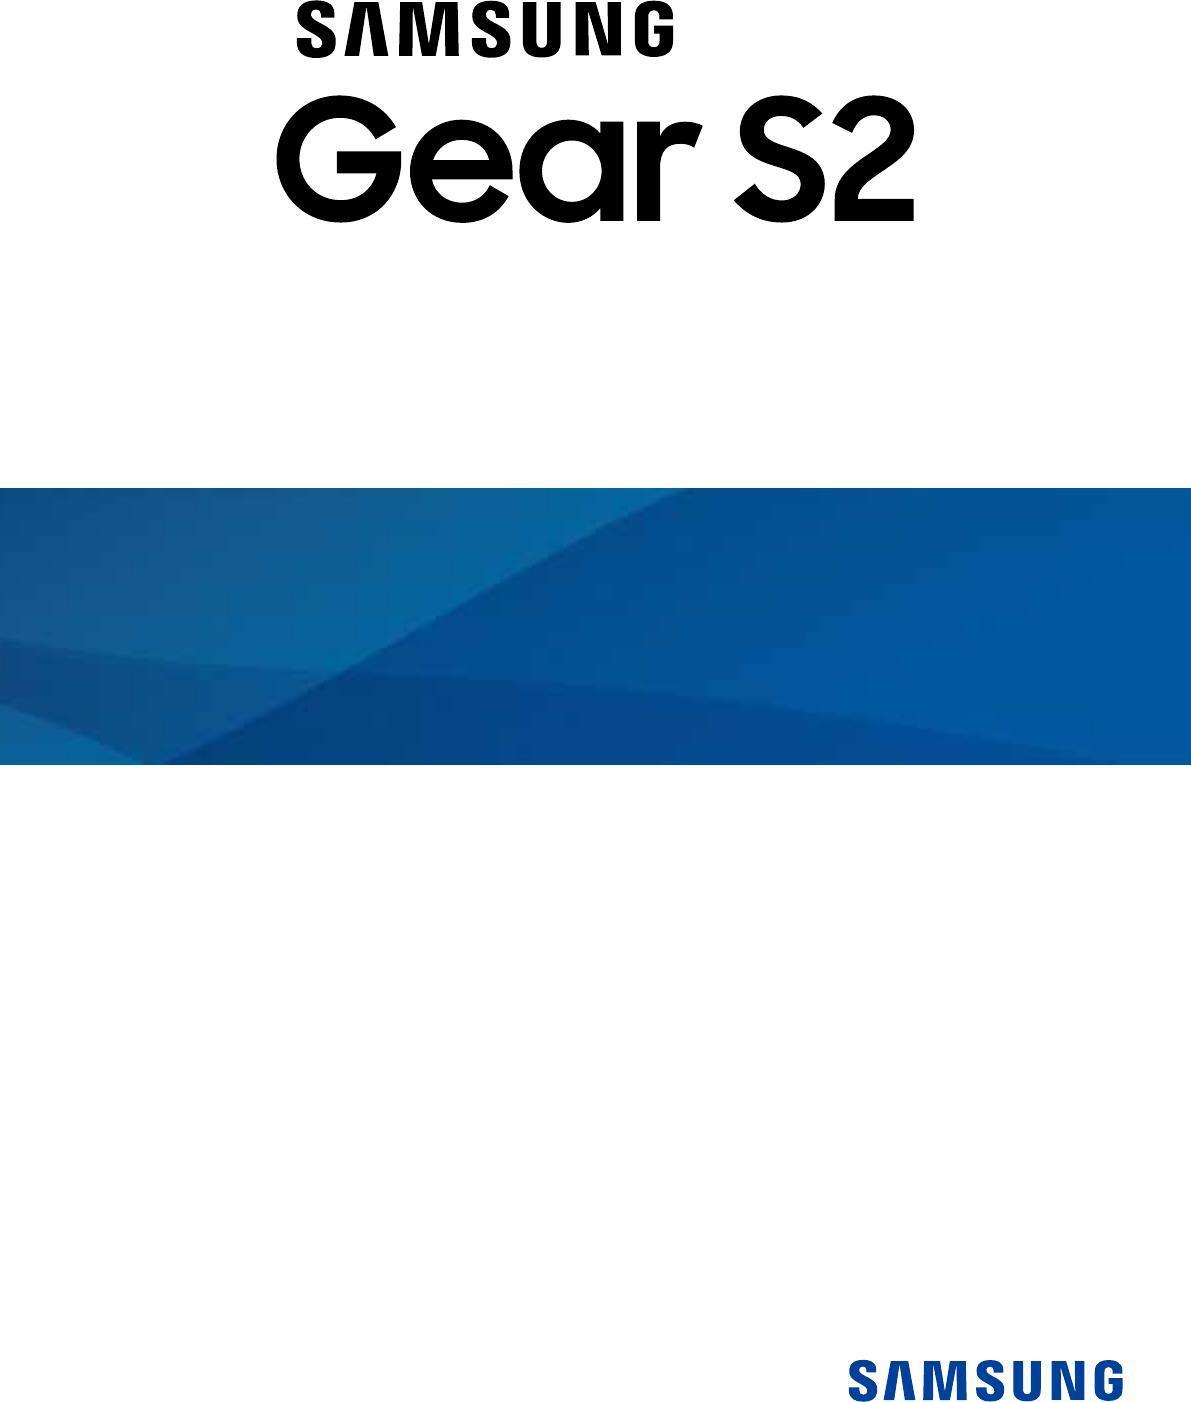 galaxy metal gear sm r720 user manual download page 1 rh rsmanuals com Manual Gearbox Manual Car